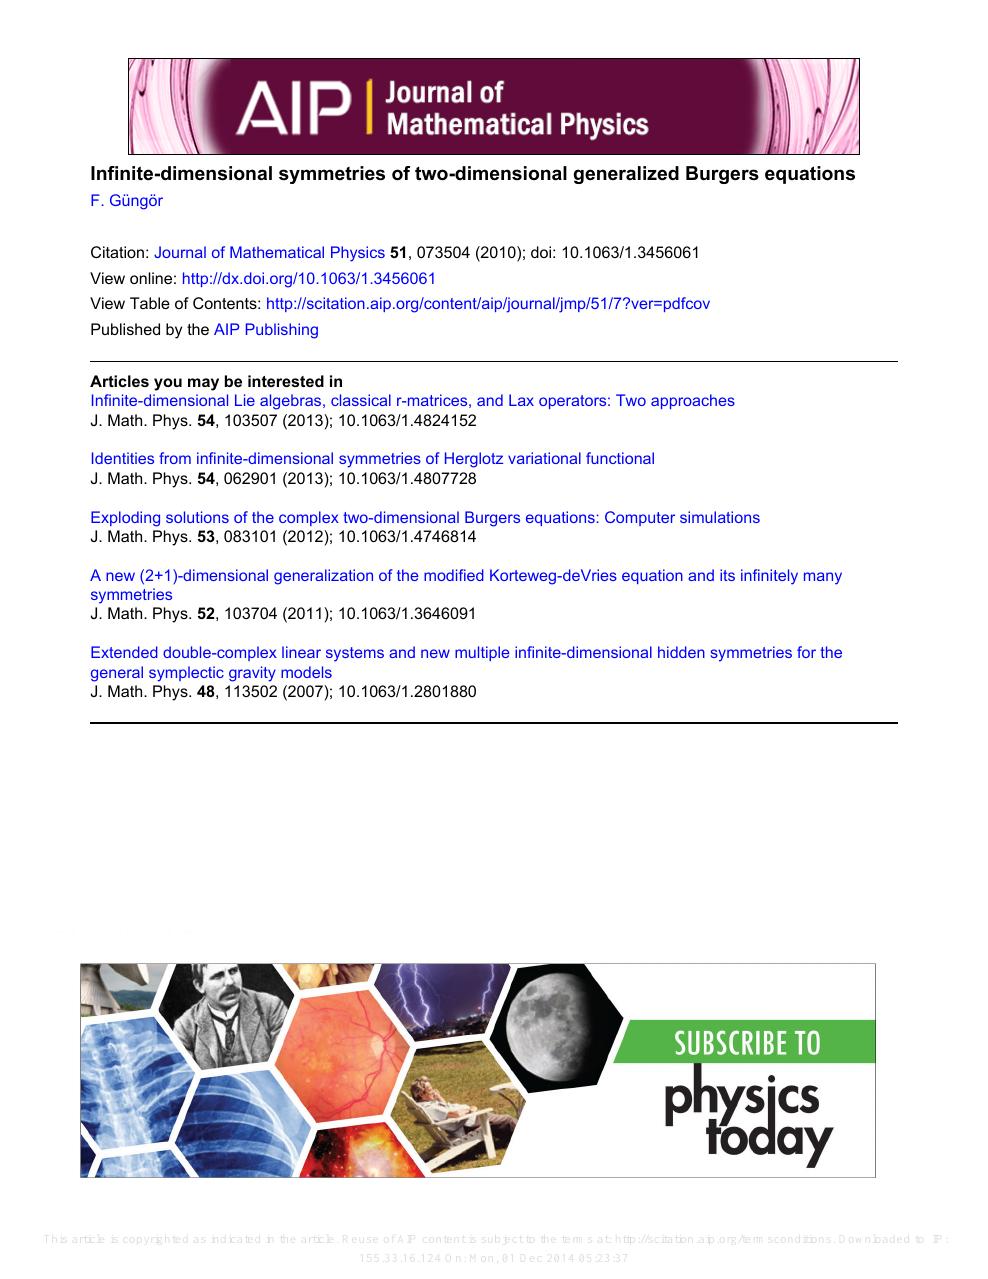 Infinite-dimensional symmetries of two-dimensional generalized